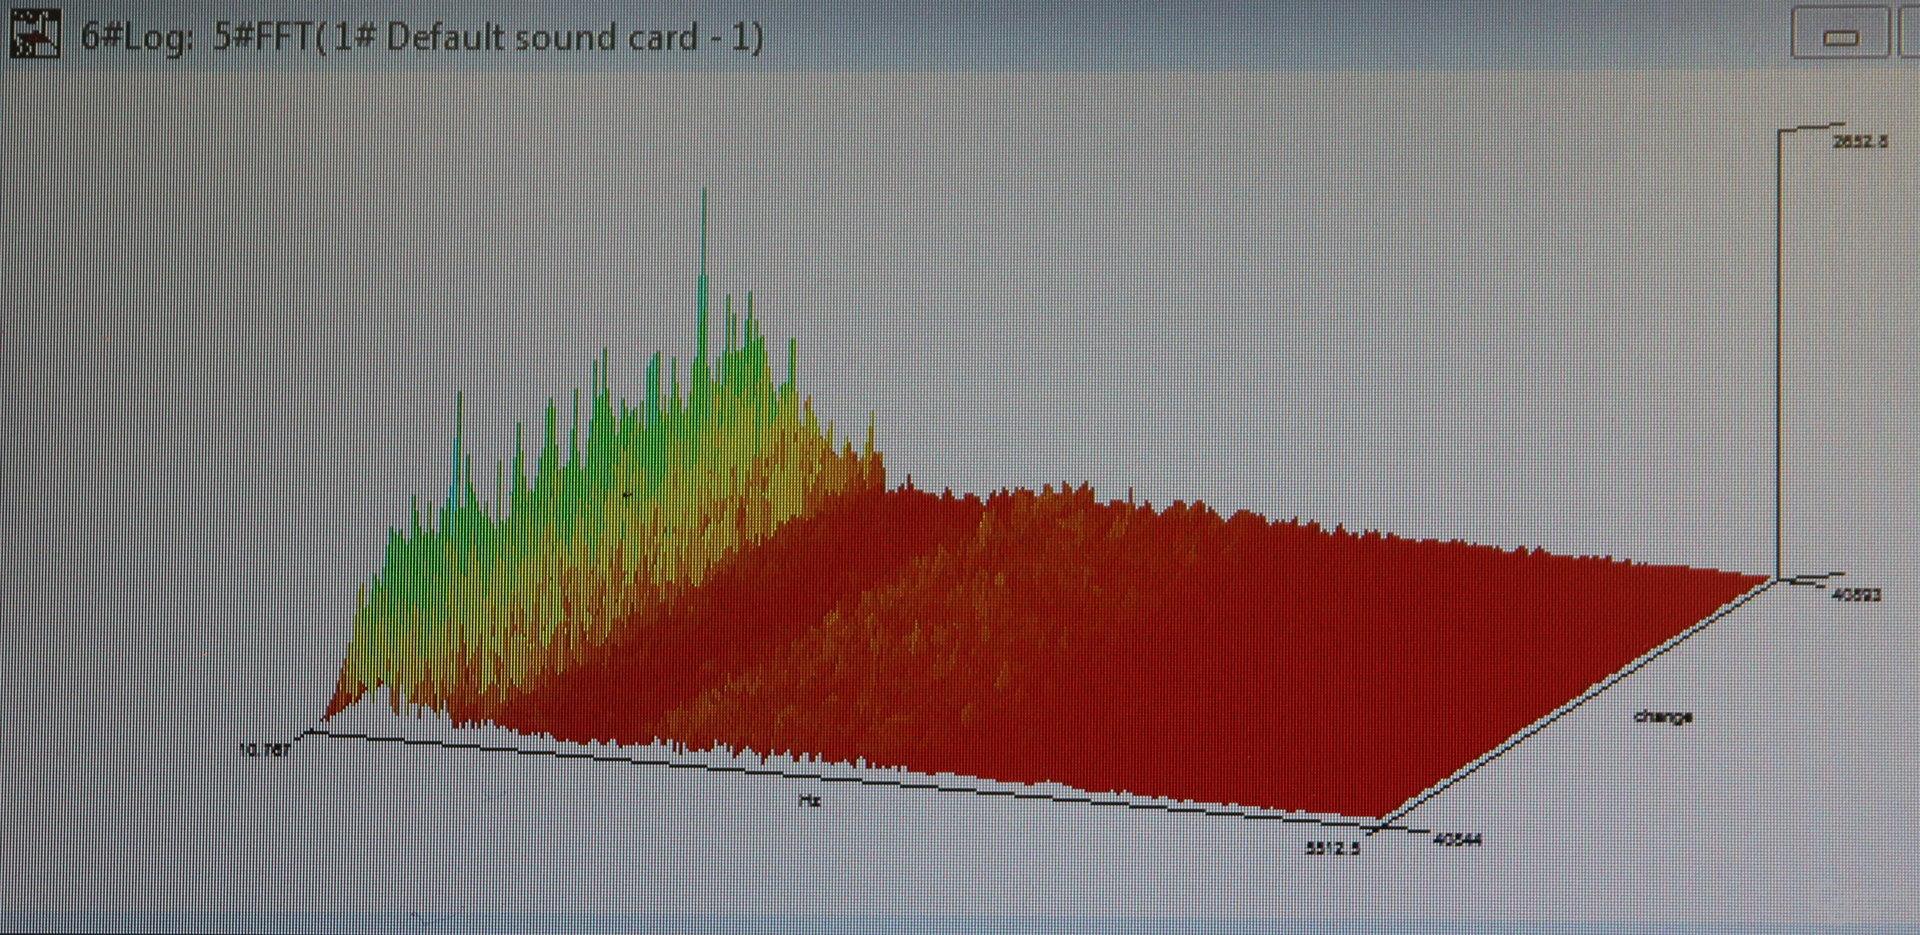 Geräuschunterdrückung aktiv